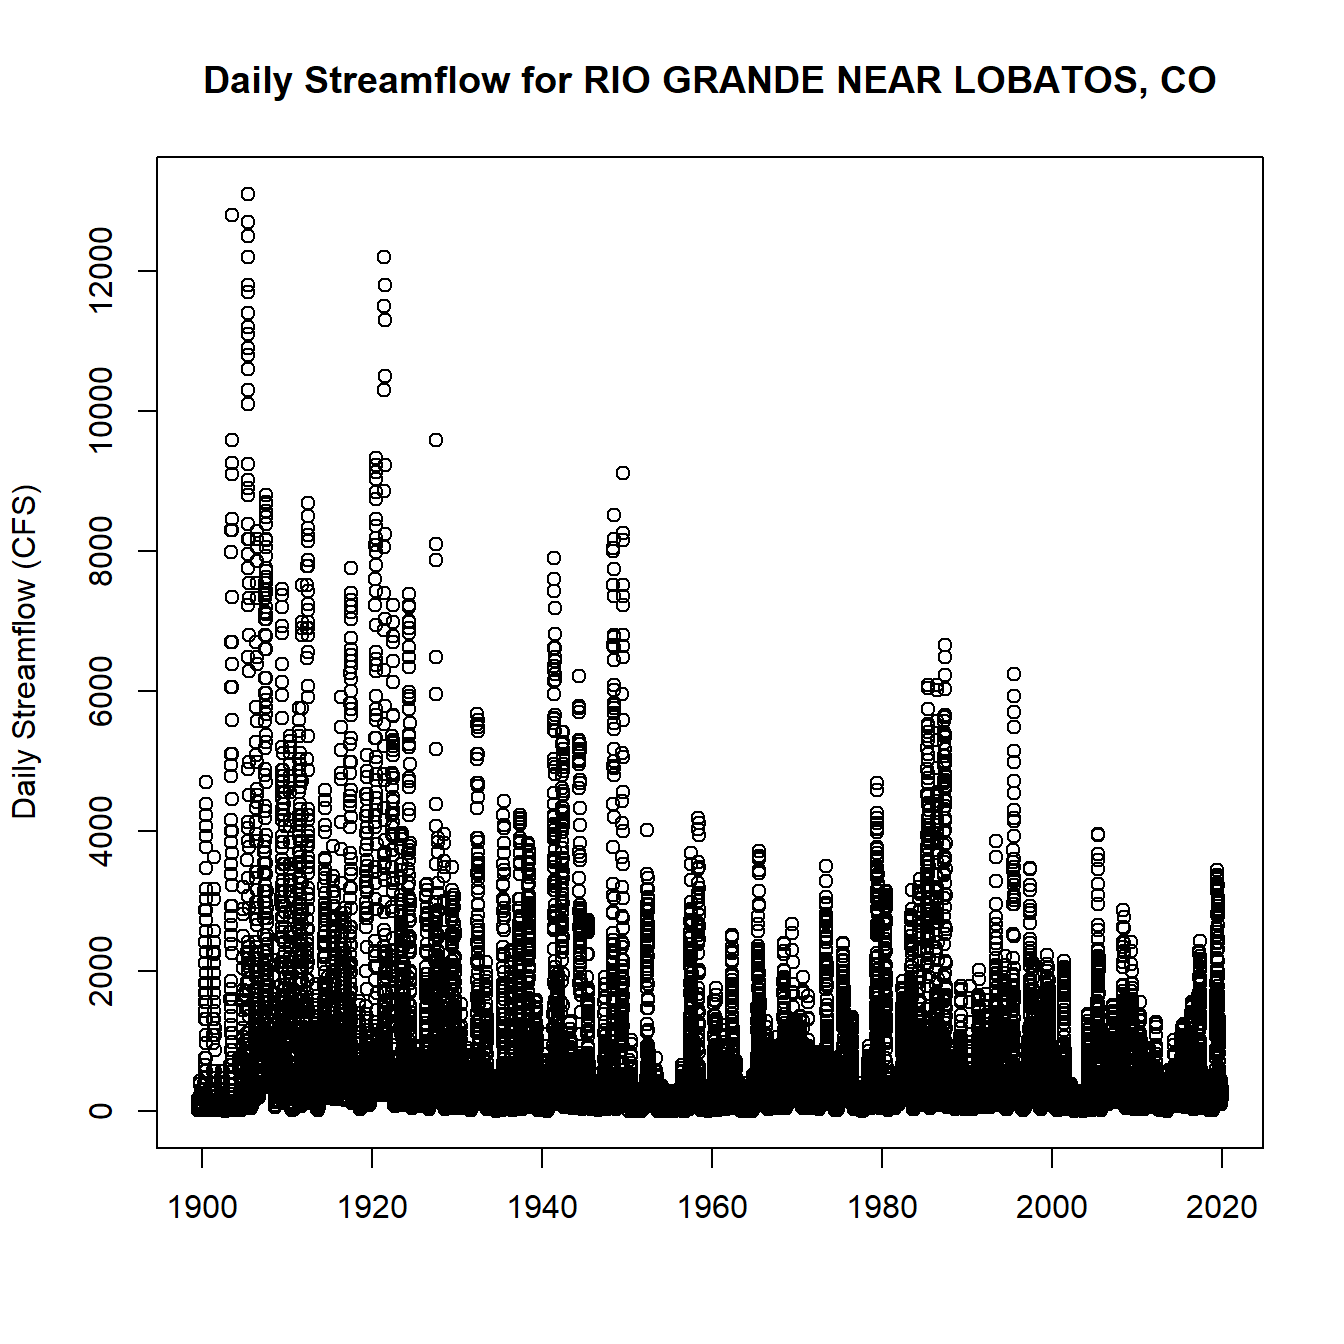 Daily Streamflow Plot